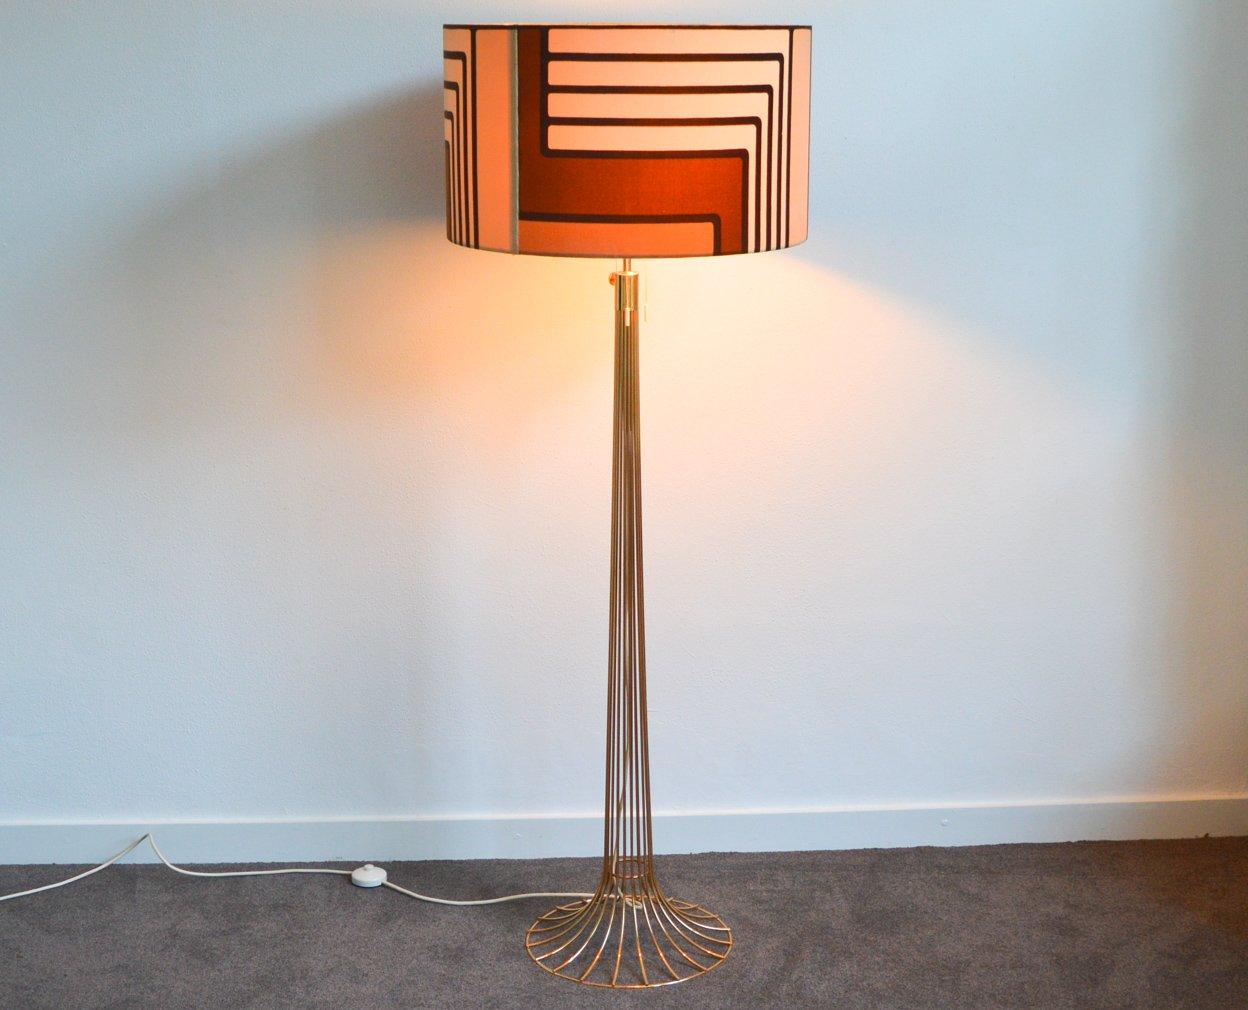 Vintage wire floor lamp by verner panton for fritz hansen 1960s for vintage wire floor lamp by verner panton for fritz hansen 1960s greentooth Images